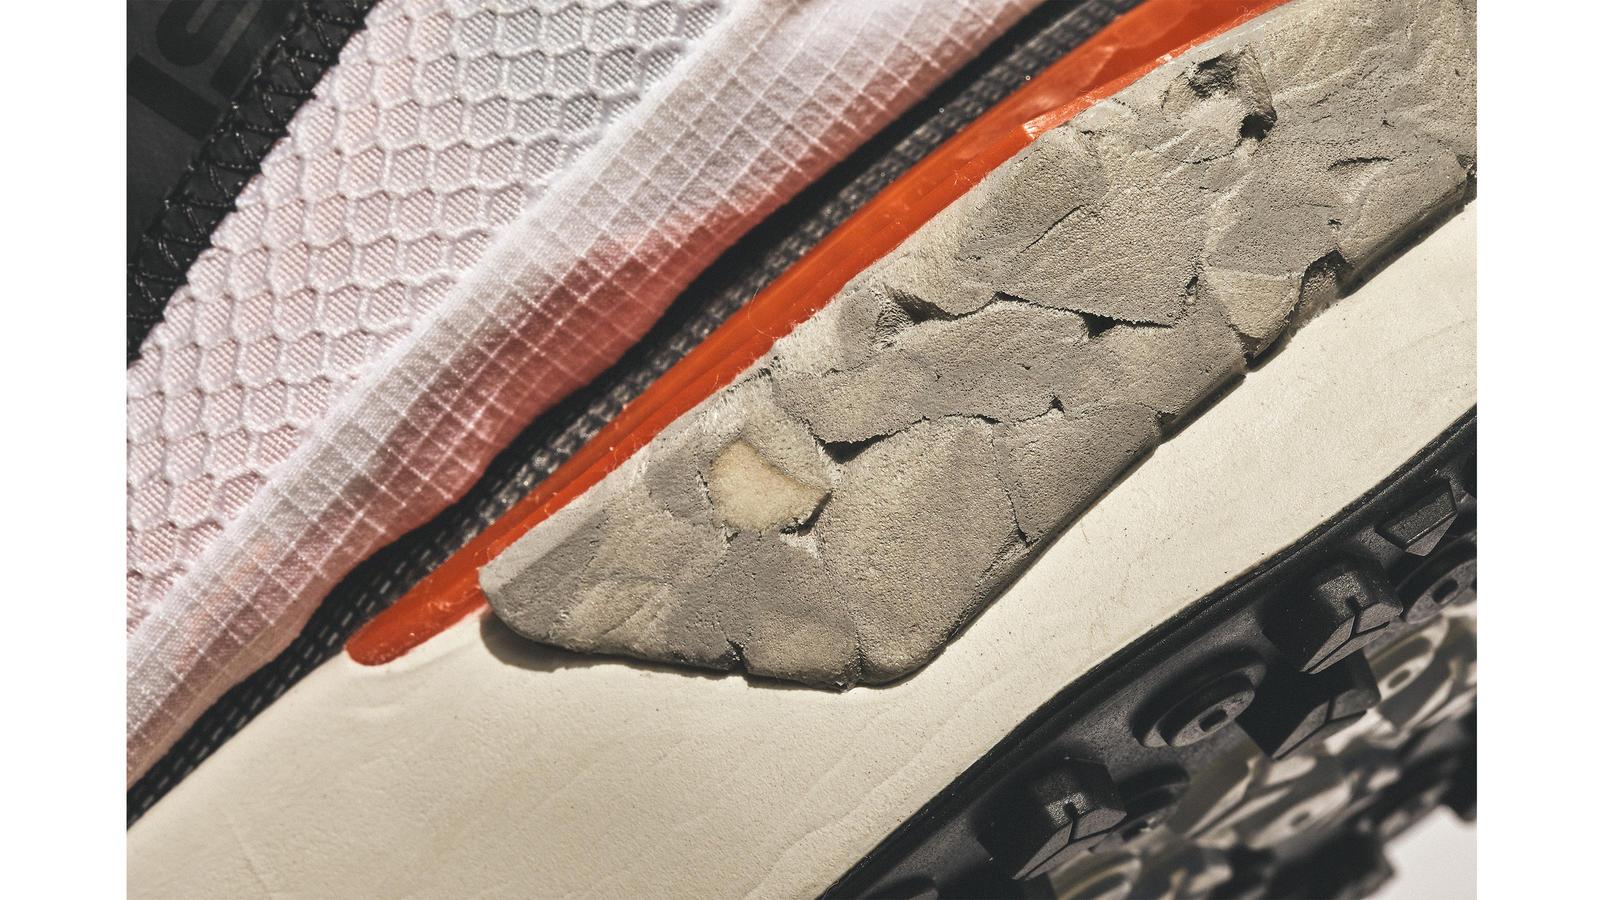 Nike ISPA Drifter Gator 25